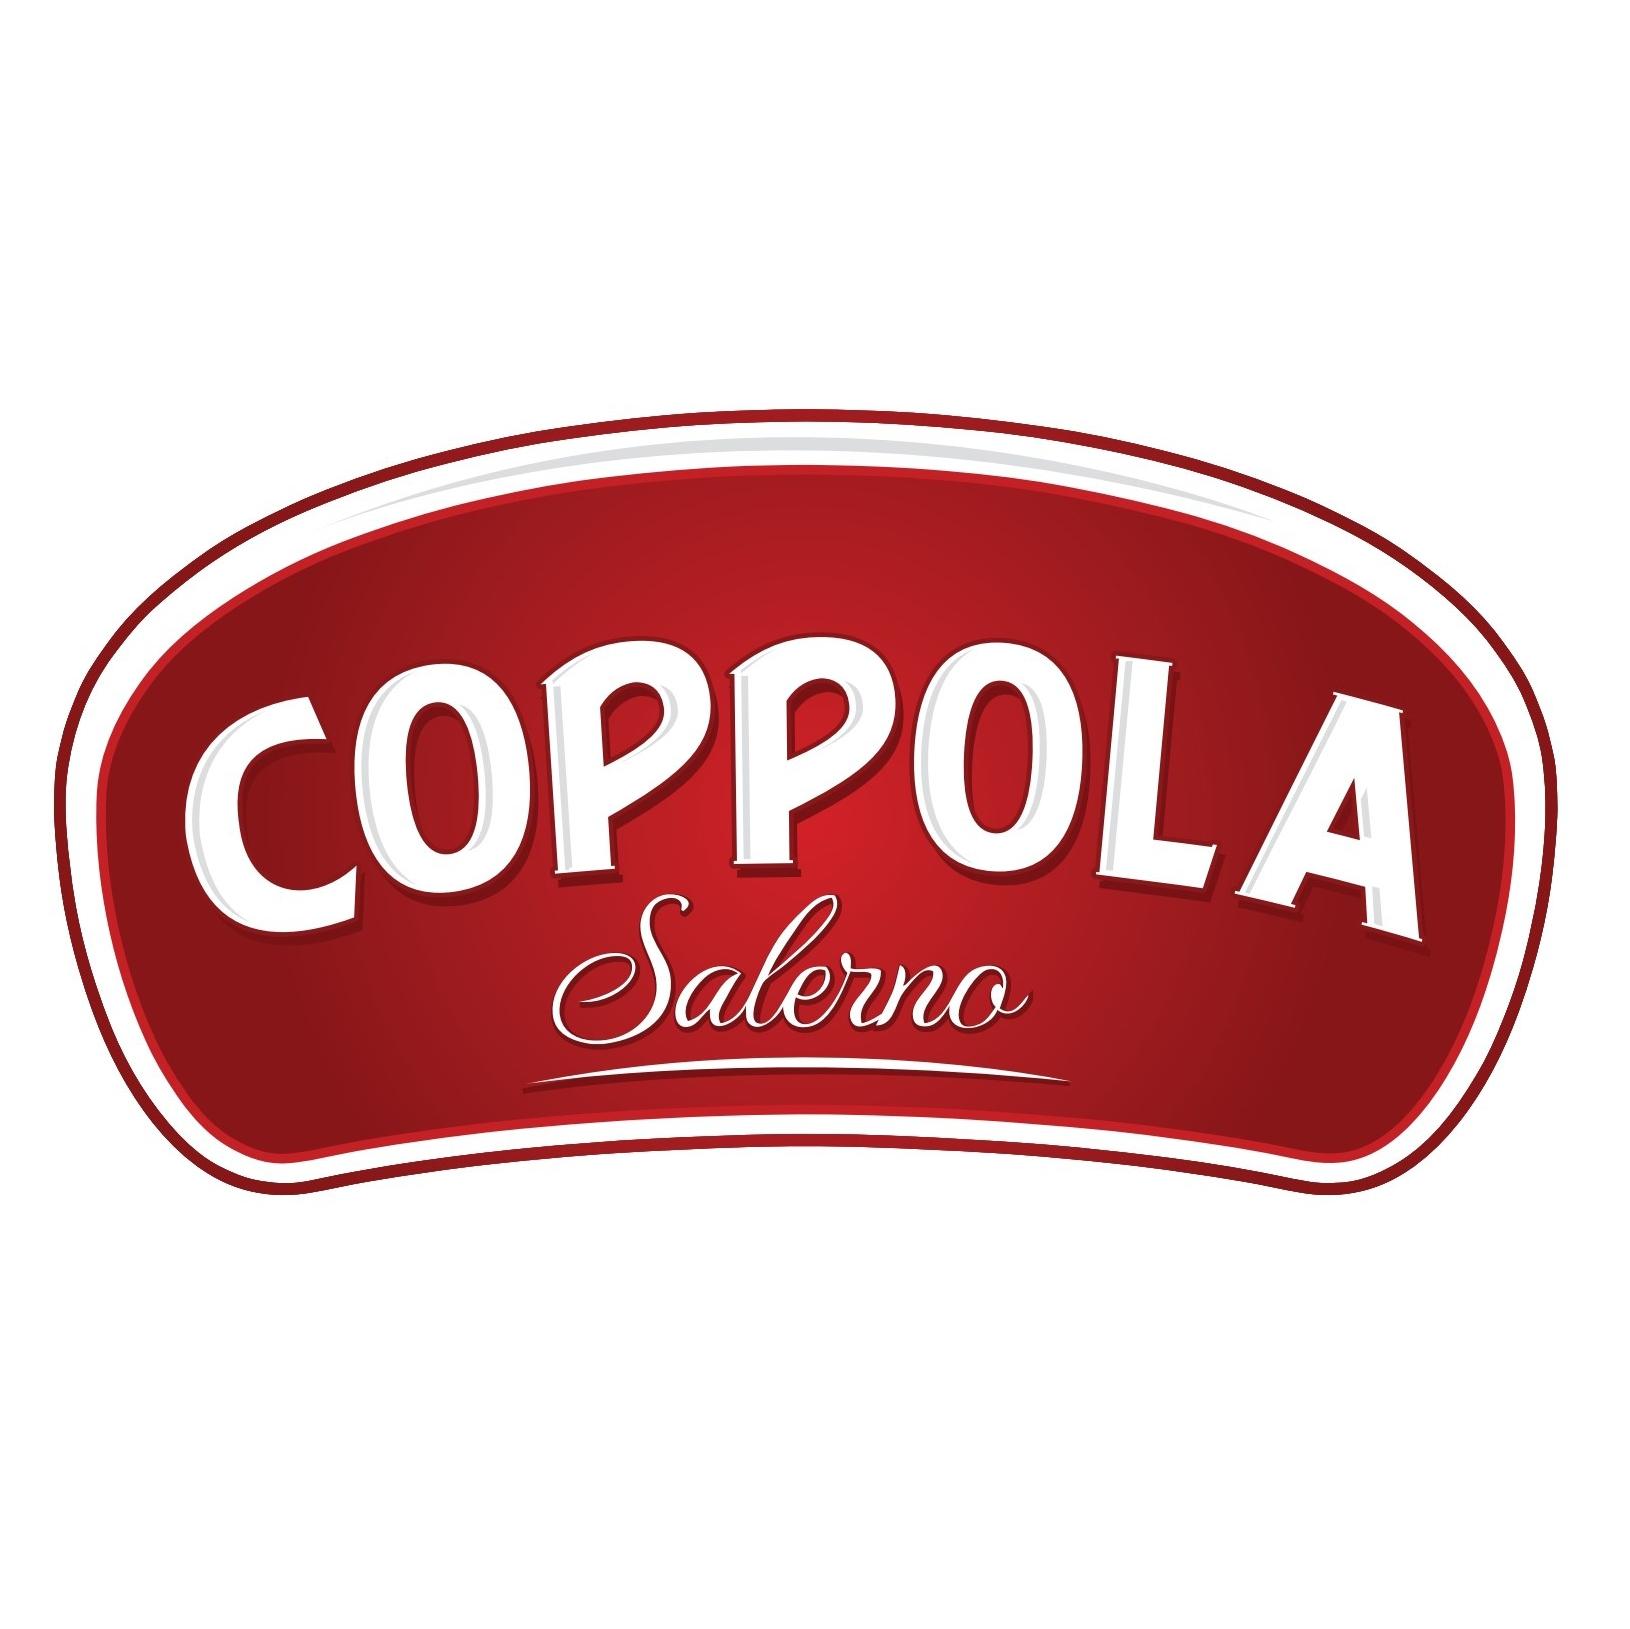 Coppola Organic Tomato Ketchup - No Sugar Added, Italy, condiment, Coppola Foods